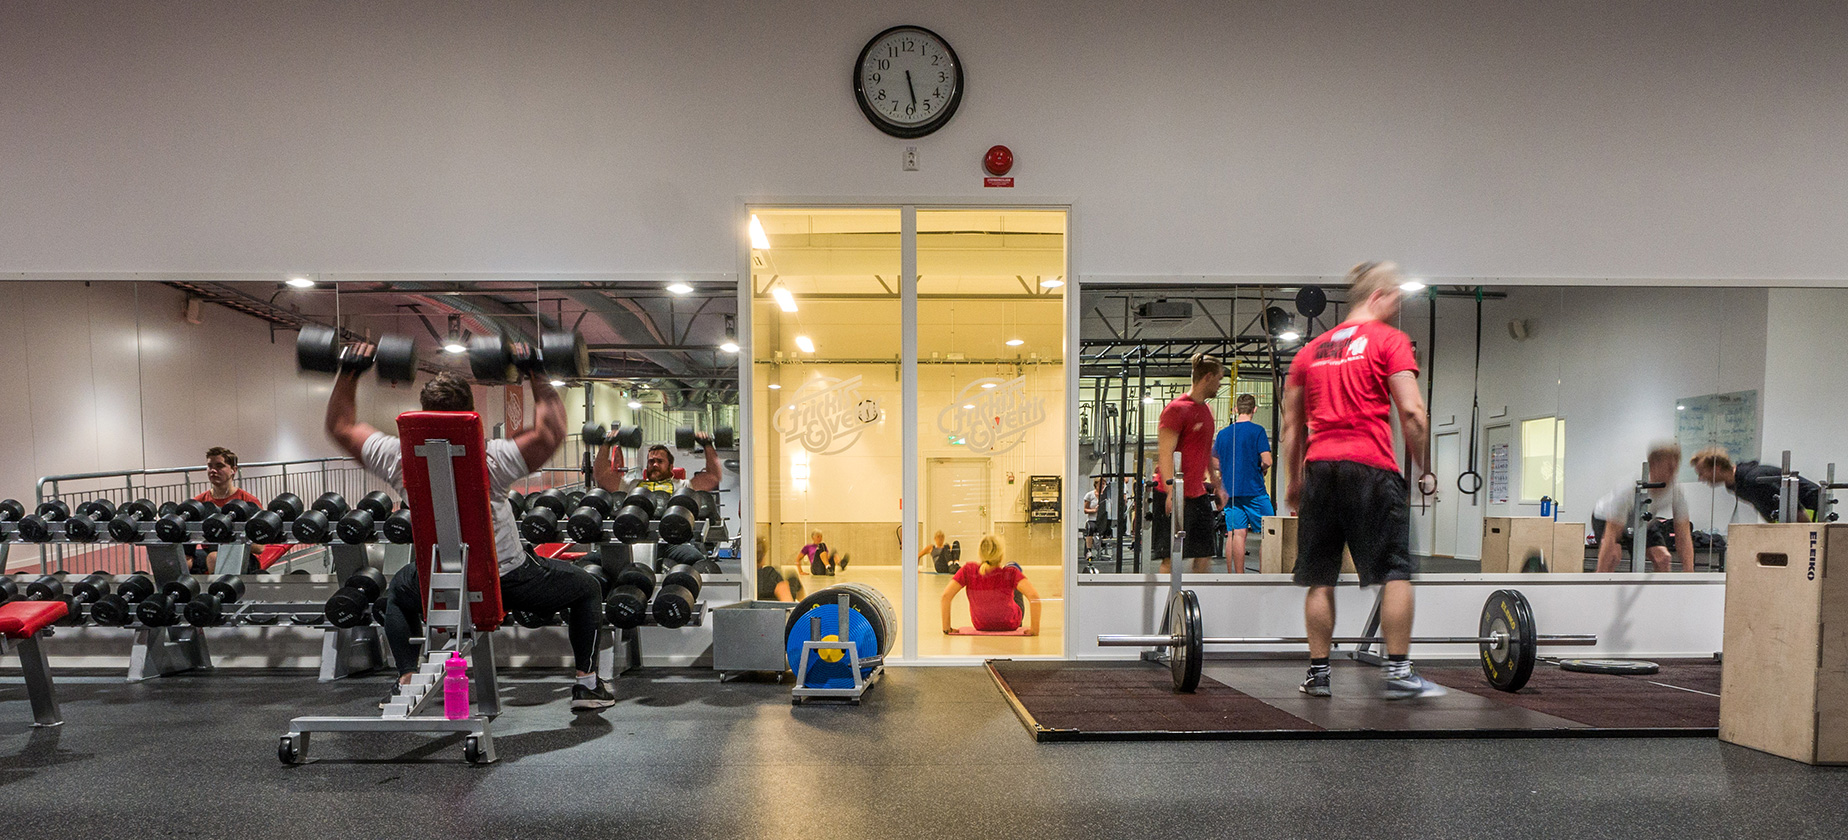 Gym-_-Fitness